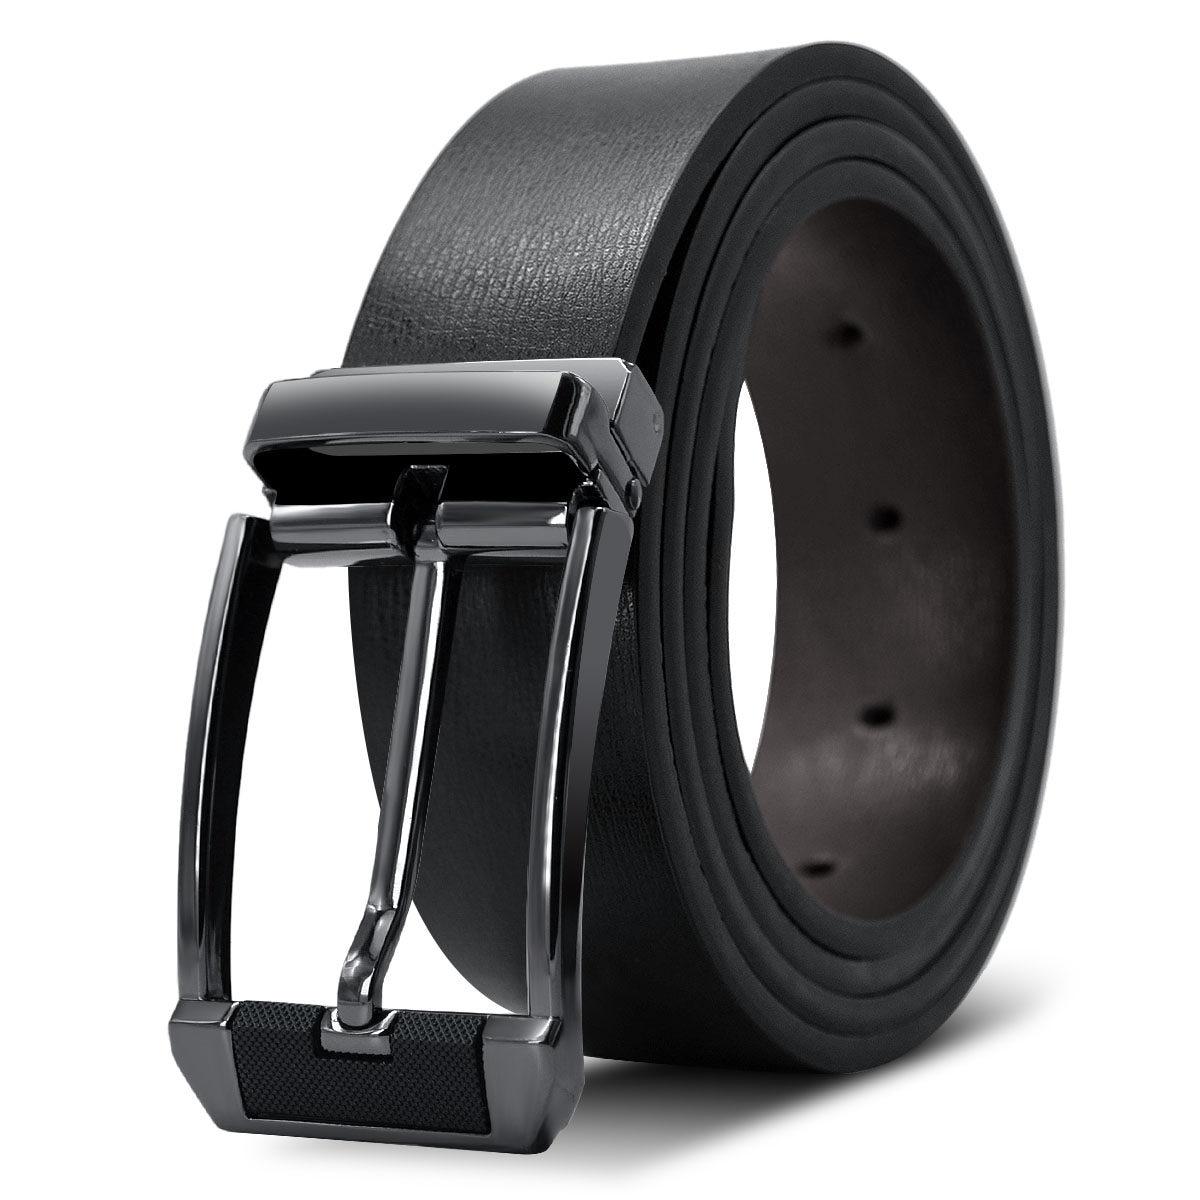 KURAN New Designer Belts Men High Quality Luxury Brand Leather Belt Pin Buckle Black Business Trouser Strap Cinturones Hombre